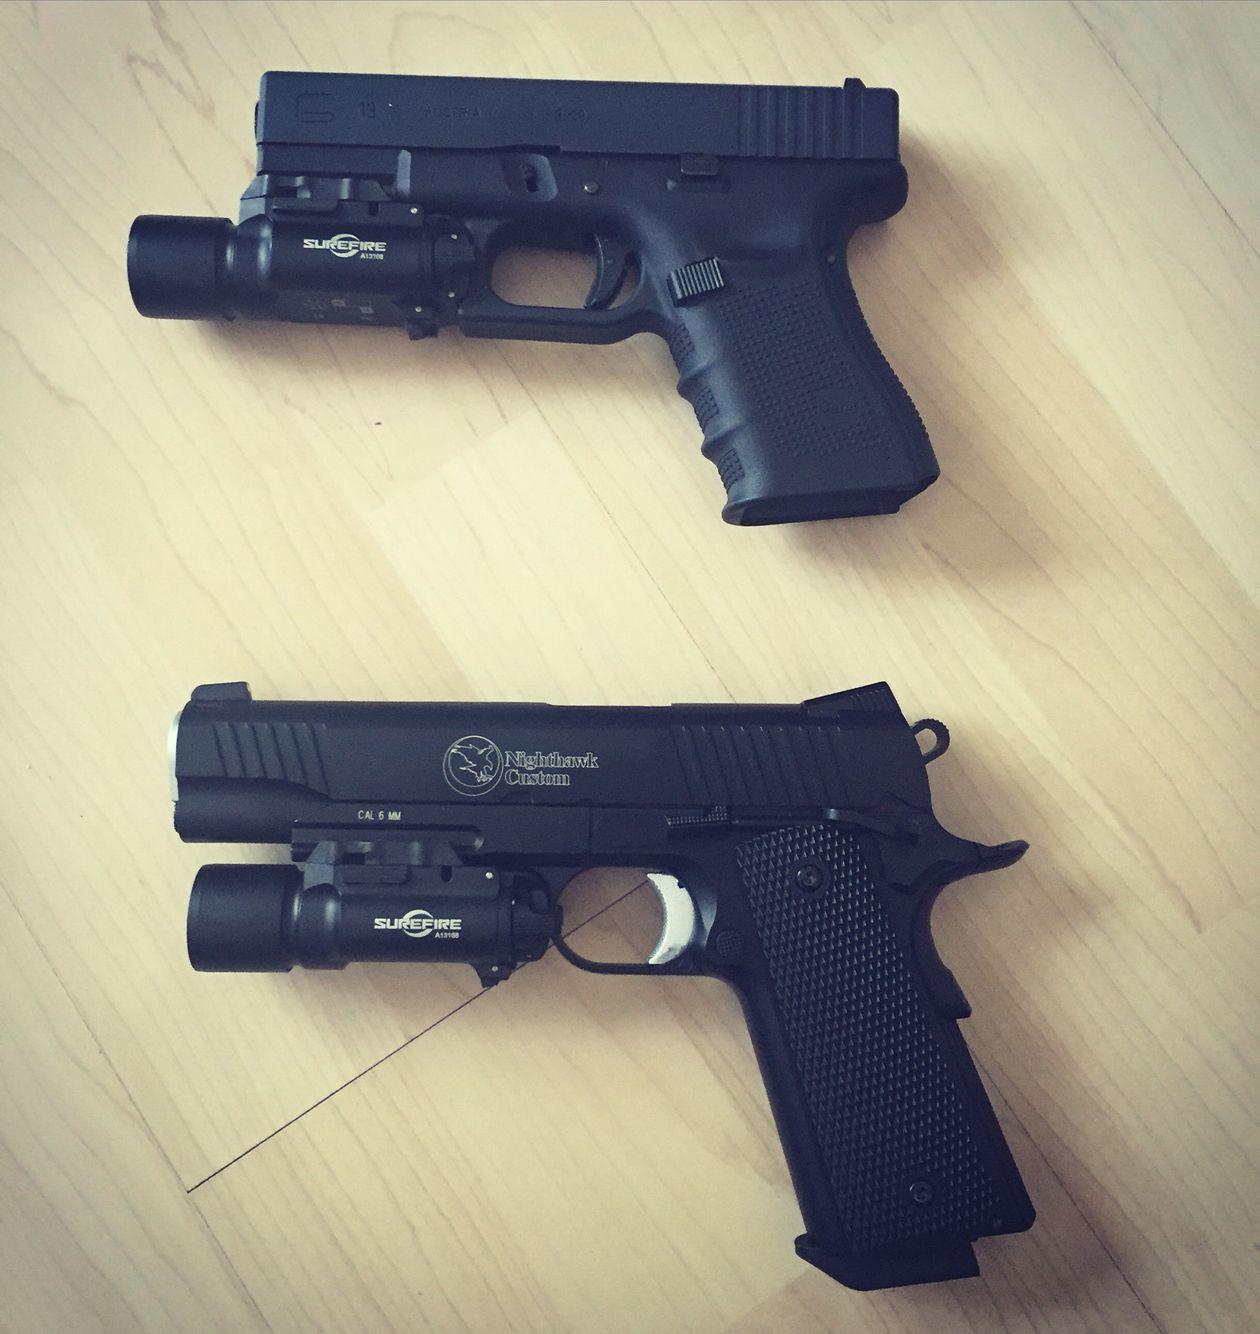 Glock 19 + Colt 1911 nighthawk custom = my babies   gun's